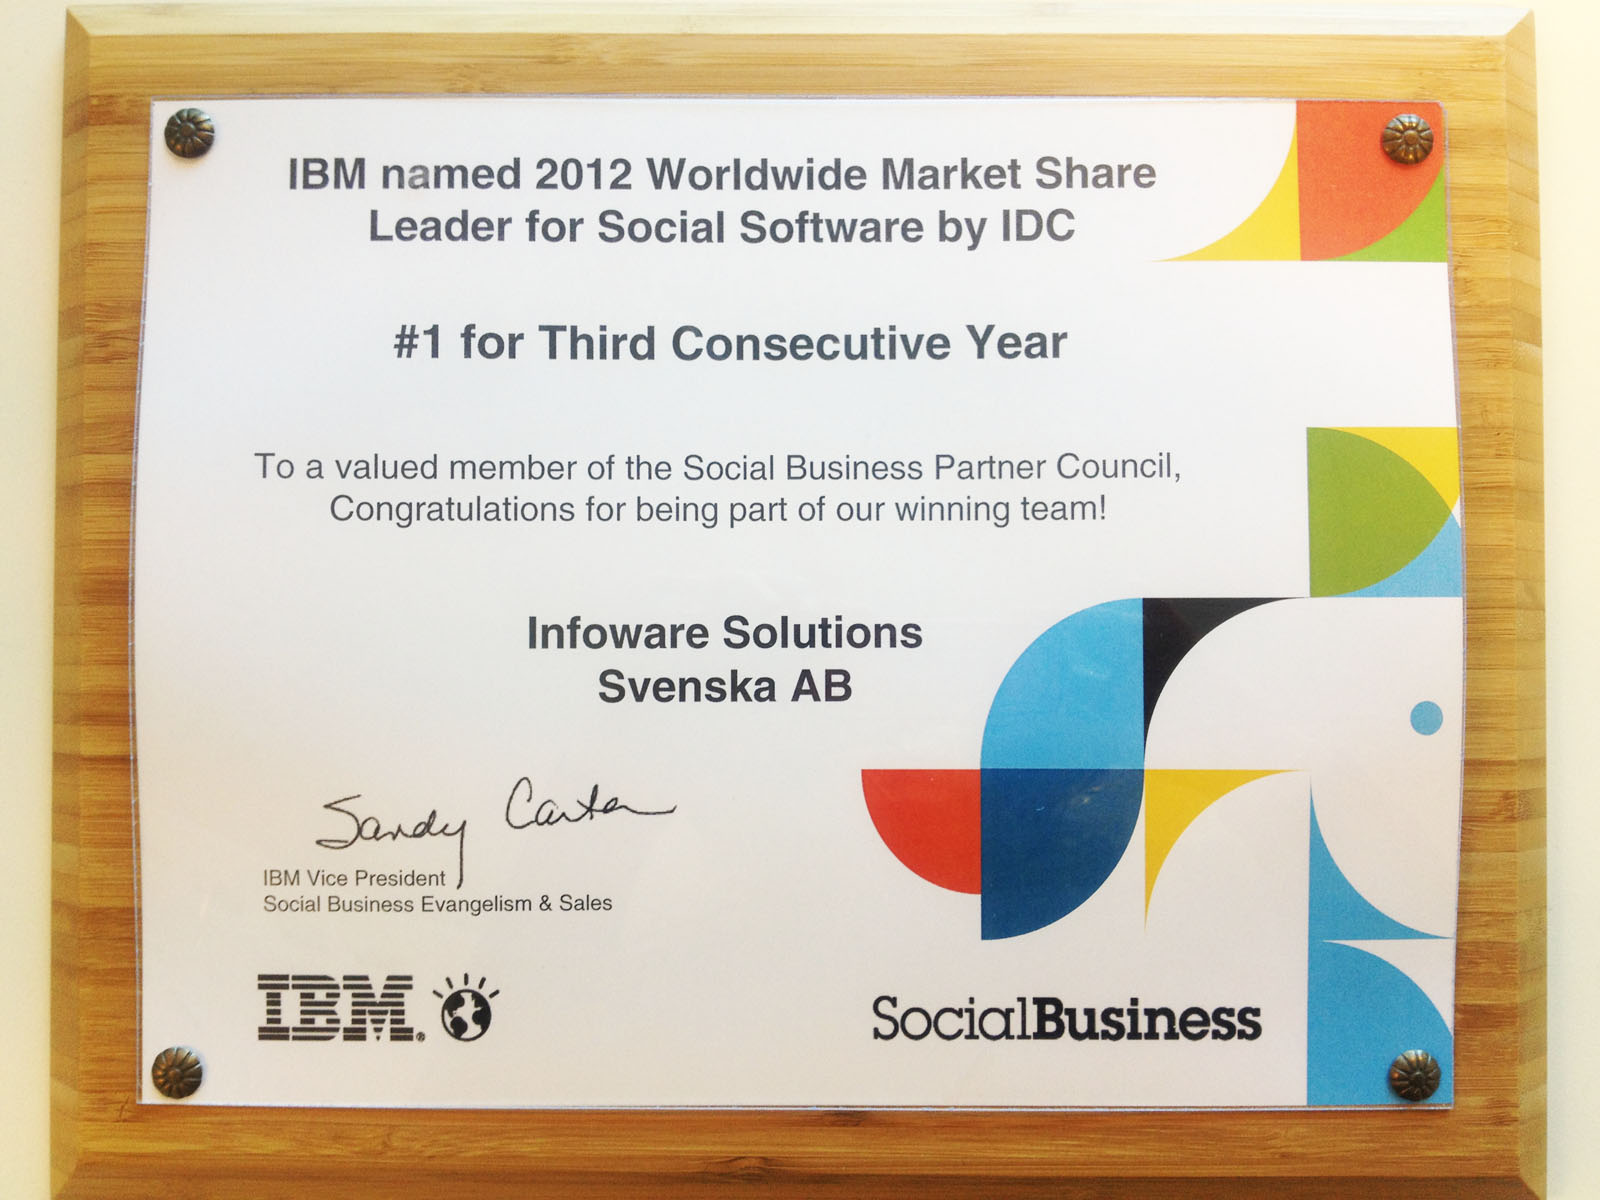 Infoware - part of IBM's winning team